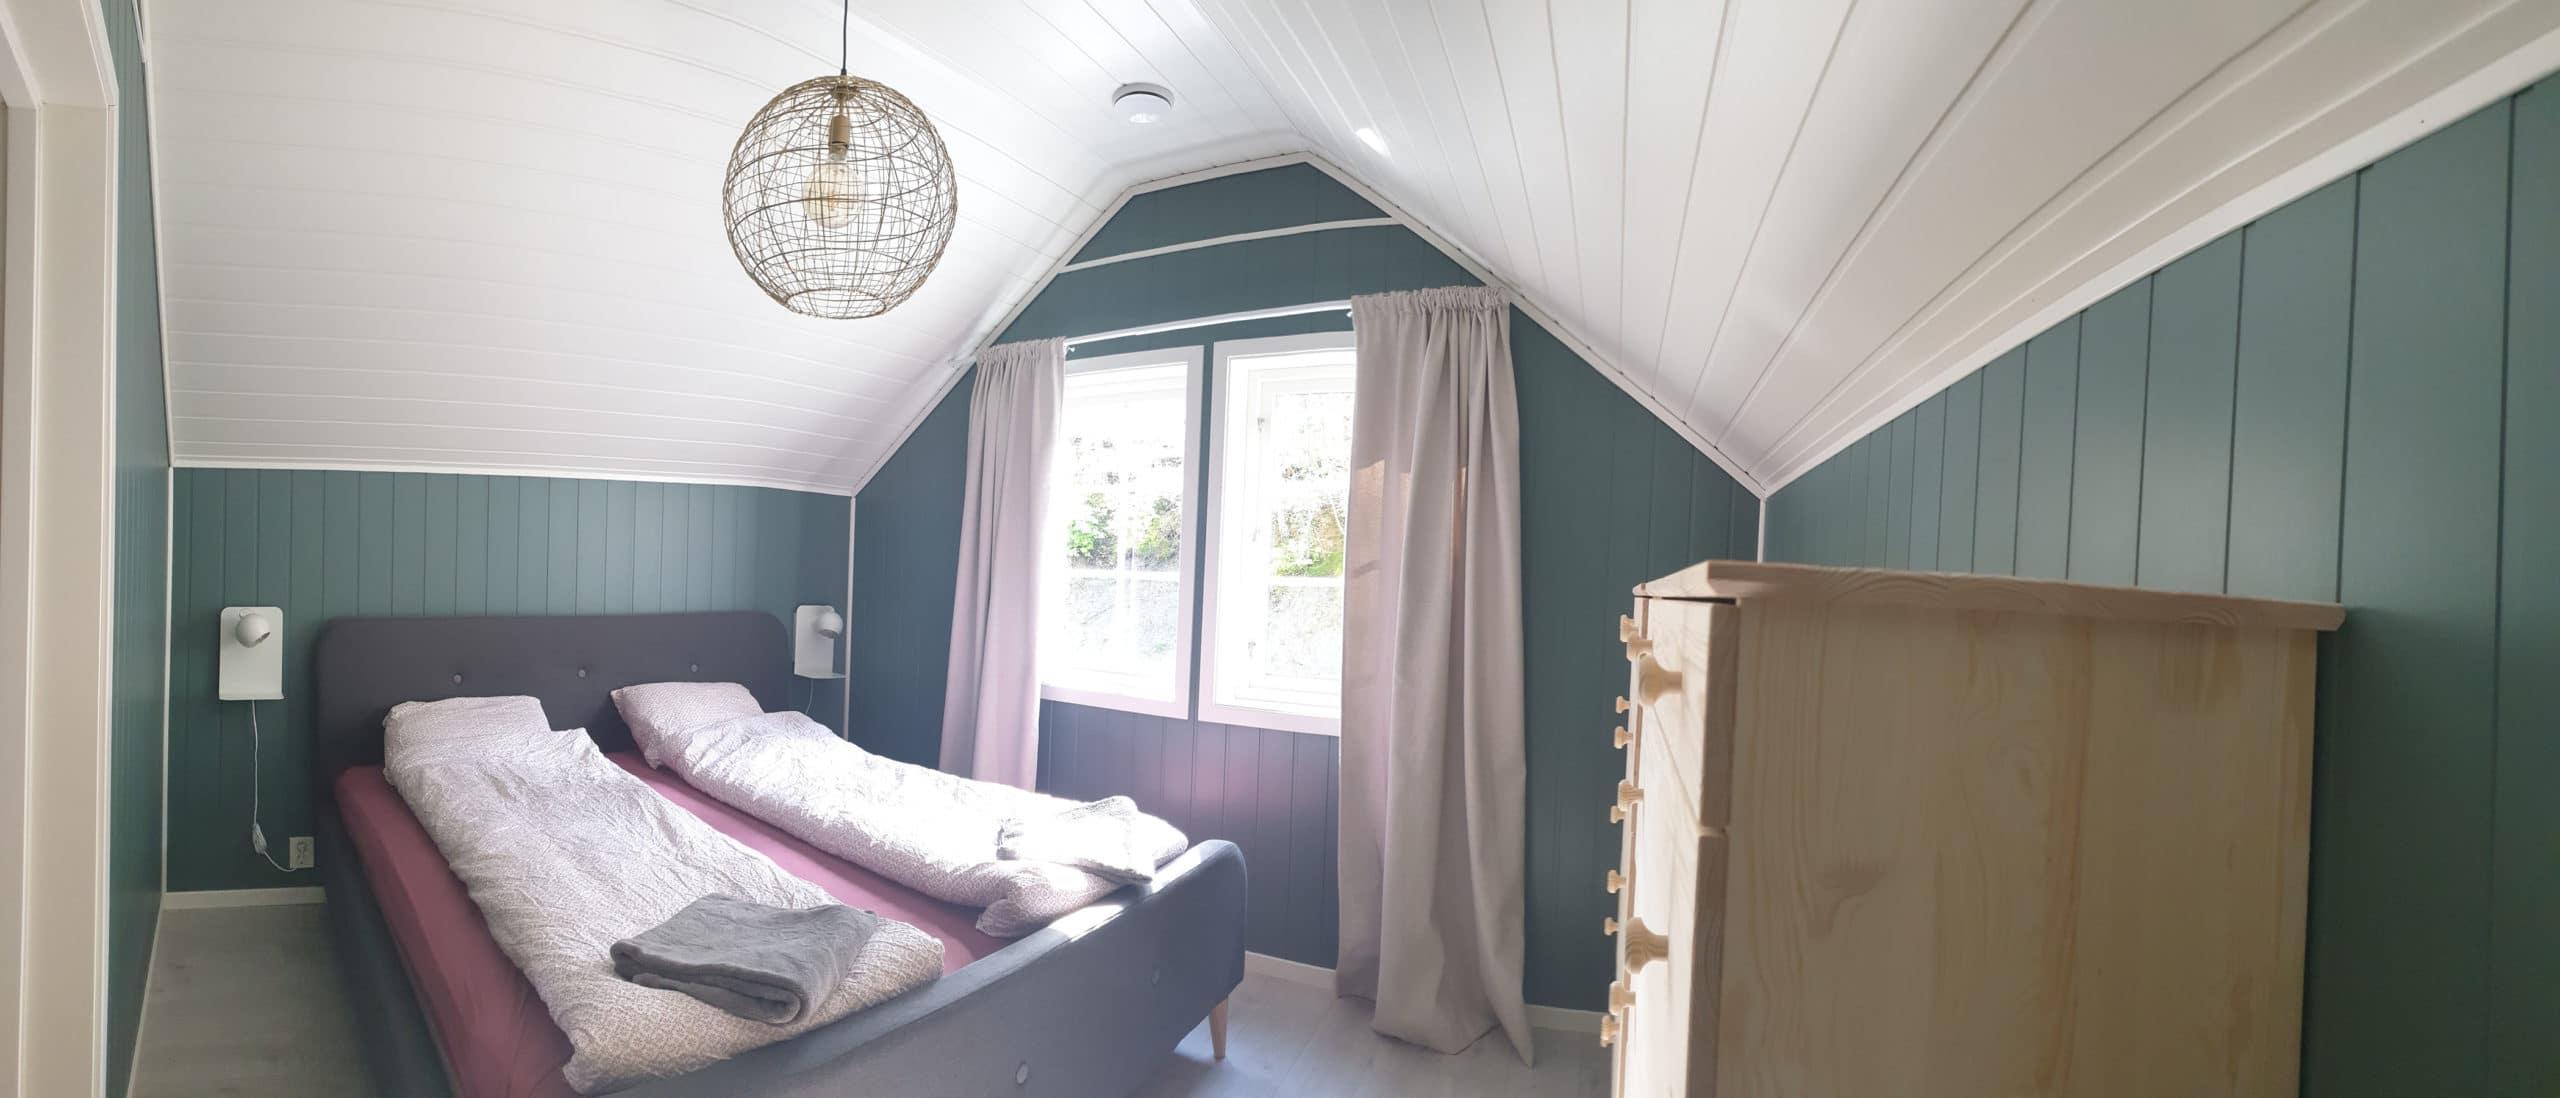 SanSelcabin Bedroom3